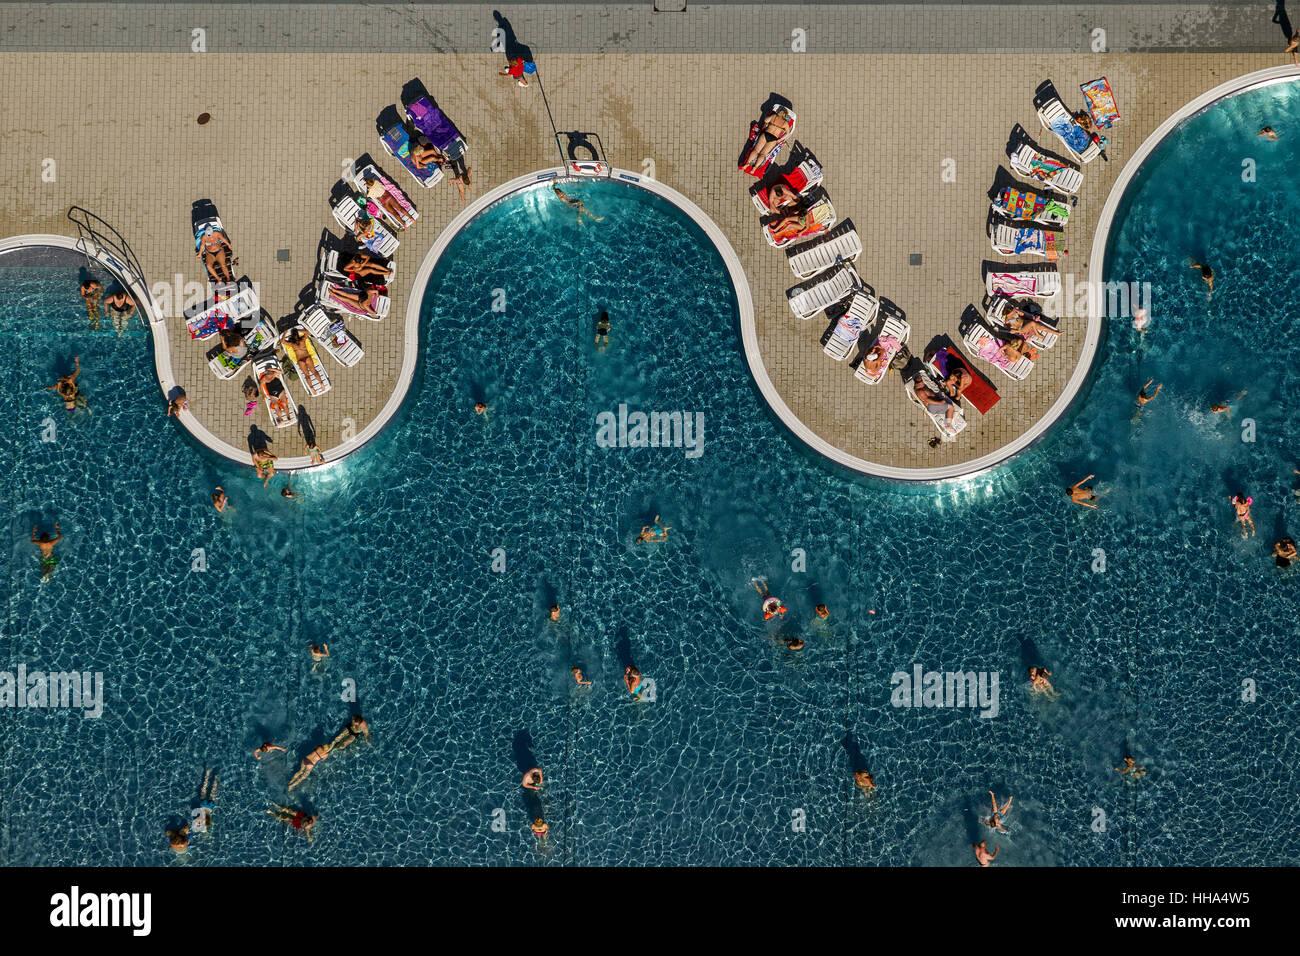 Freibad Annen, sunbathing, swimmers, leisure, waves, Witten-Annen, Witten, Ruhr area, North Rhine-Westphalia, Germany, - Stock Image